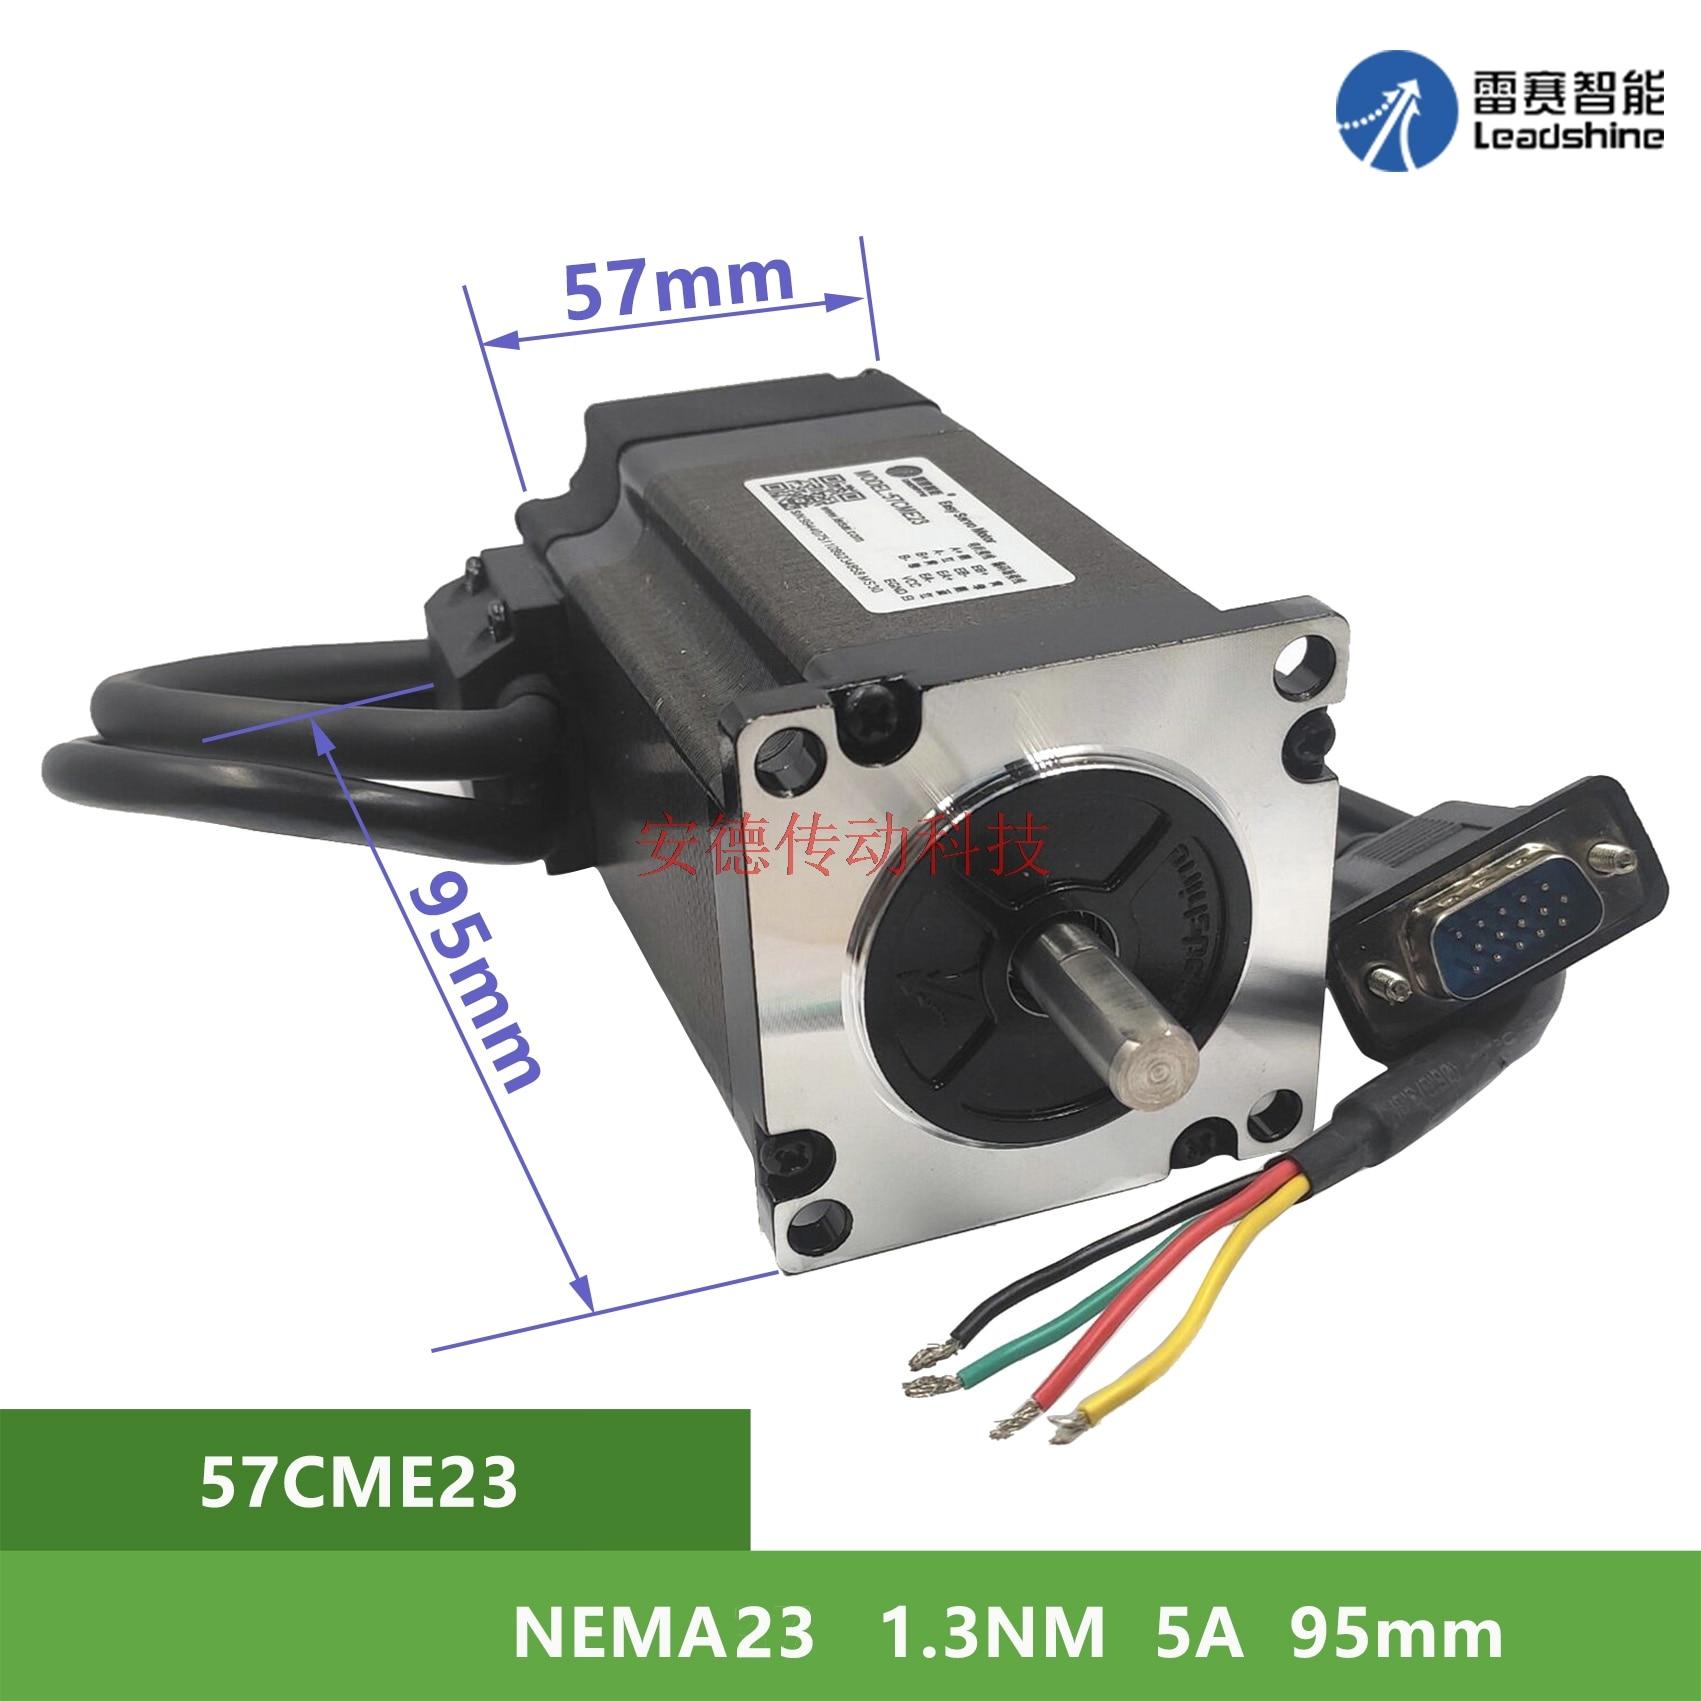 NEMA23 Leadshine 57CME23 2.3Nm 5AClosed حلقة محرك مؤازر 2 المرحلة رمح القطر 8 مللي متر